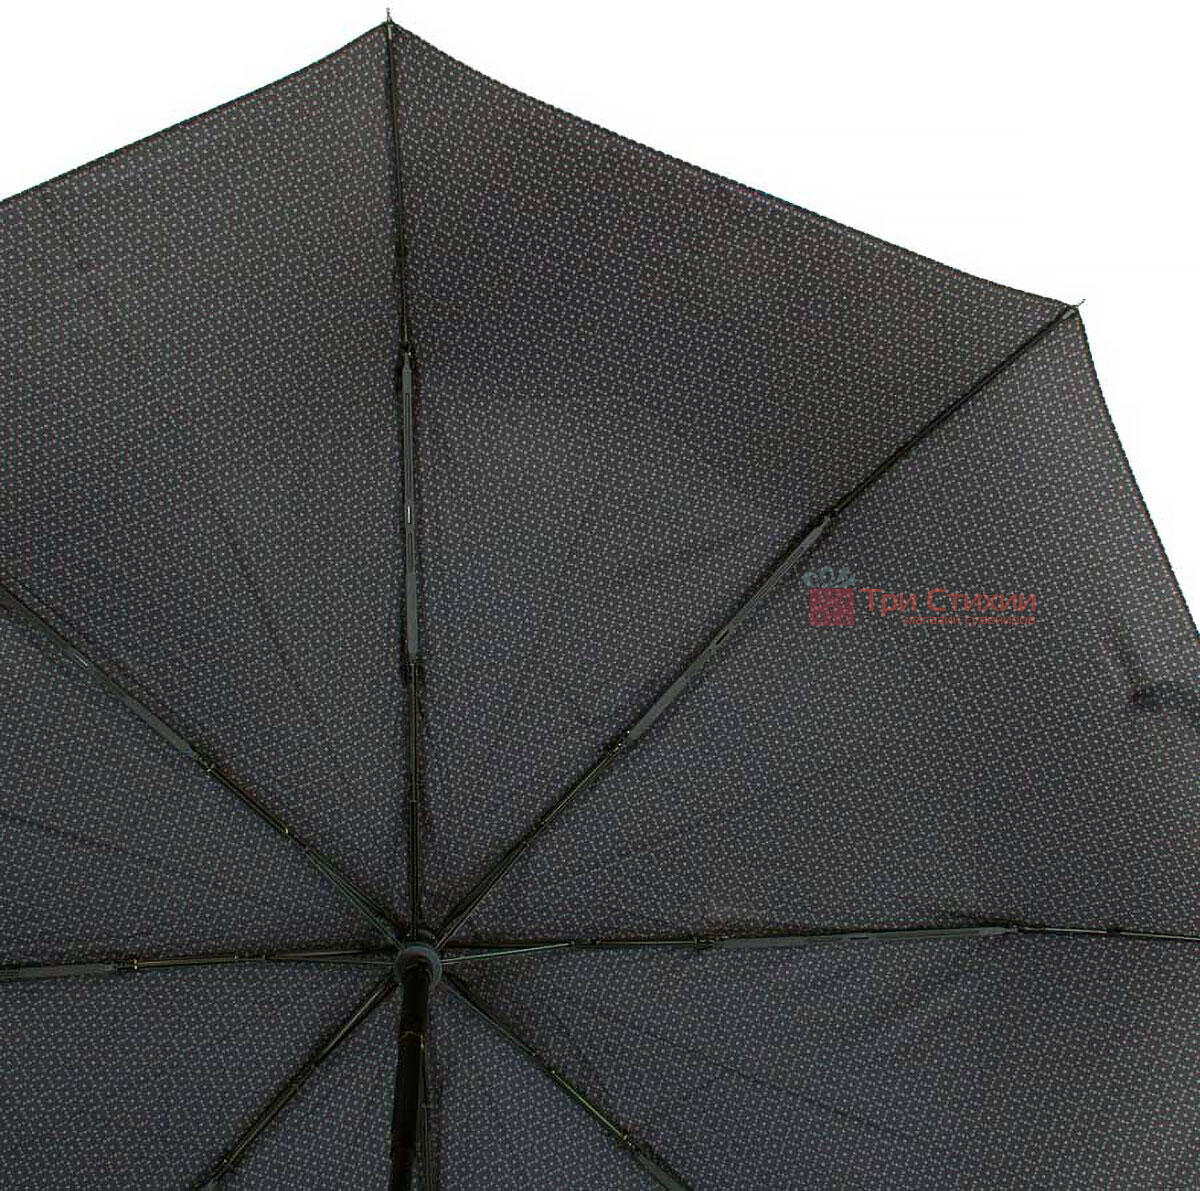 Зонт складной Bugatti 74667BU полный автомат Серый, фото 4